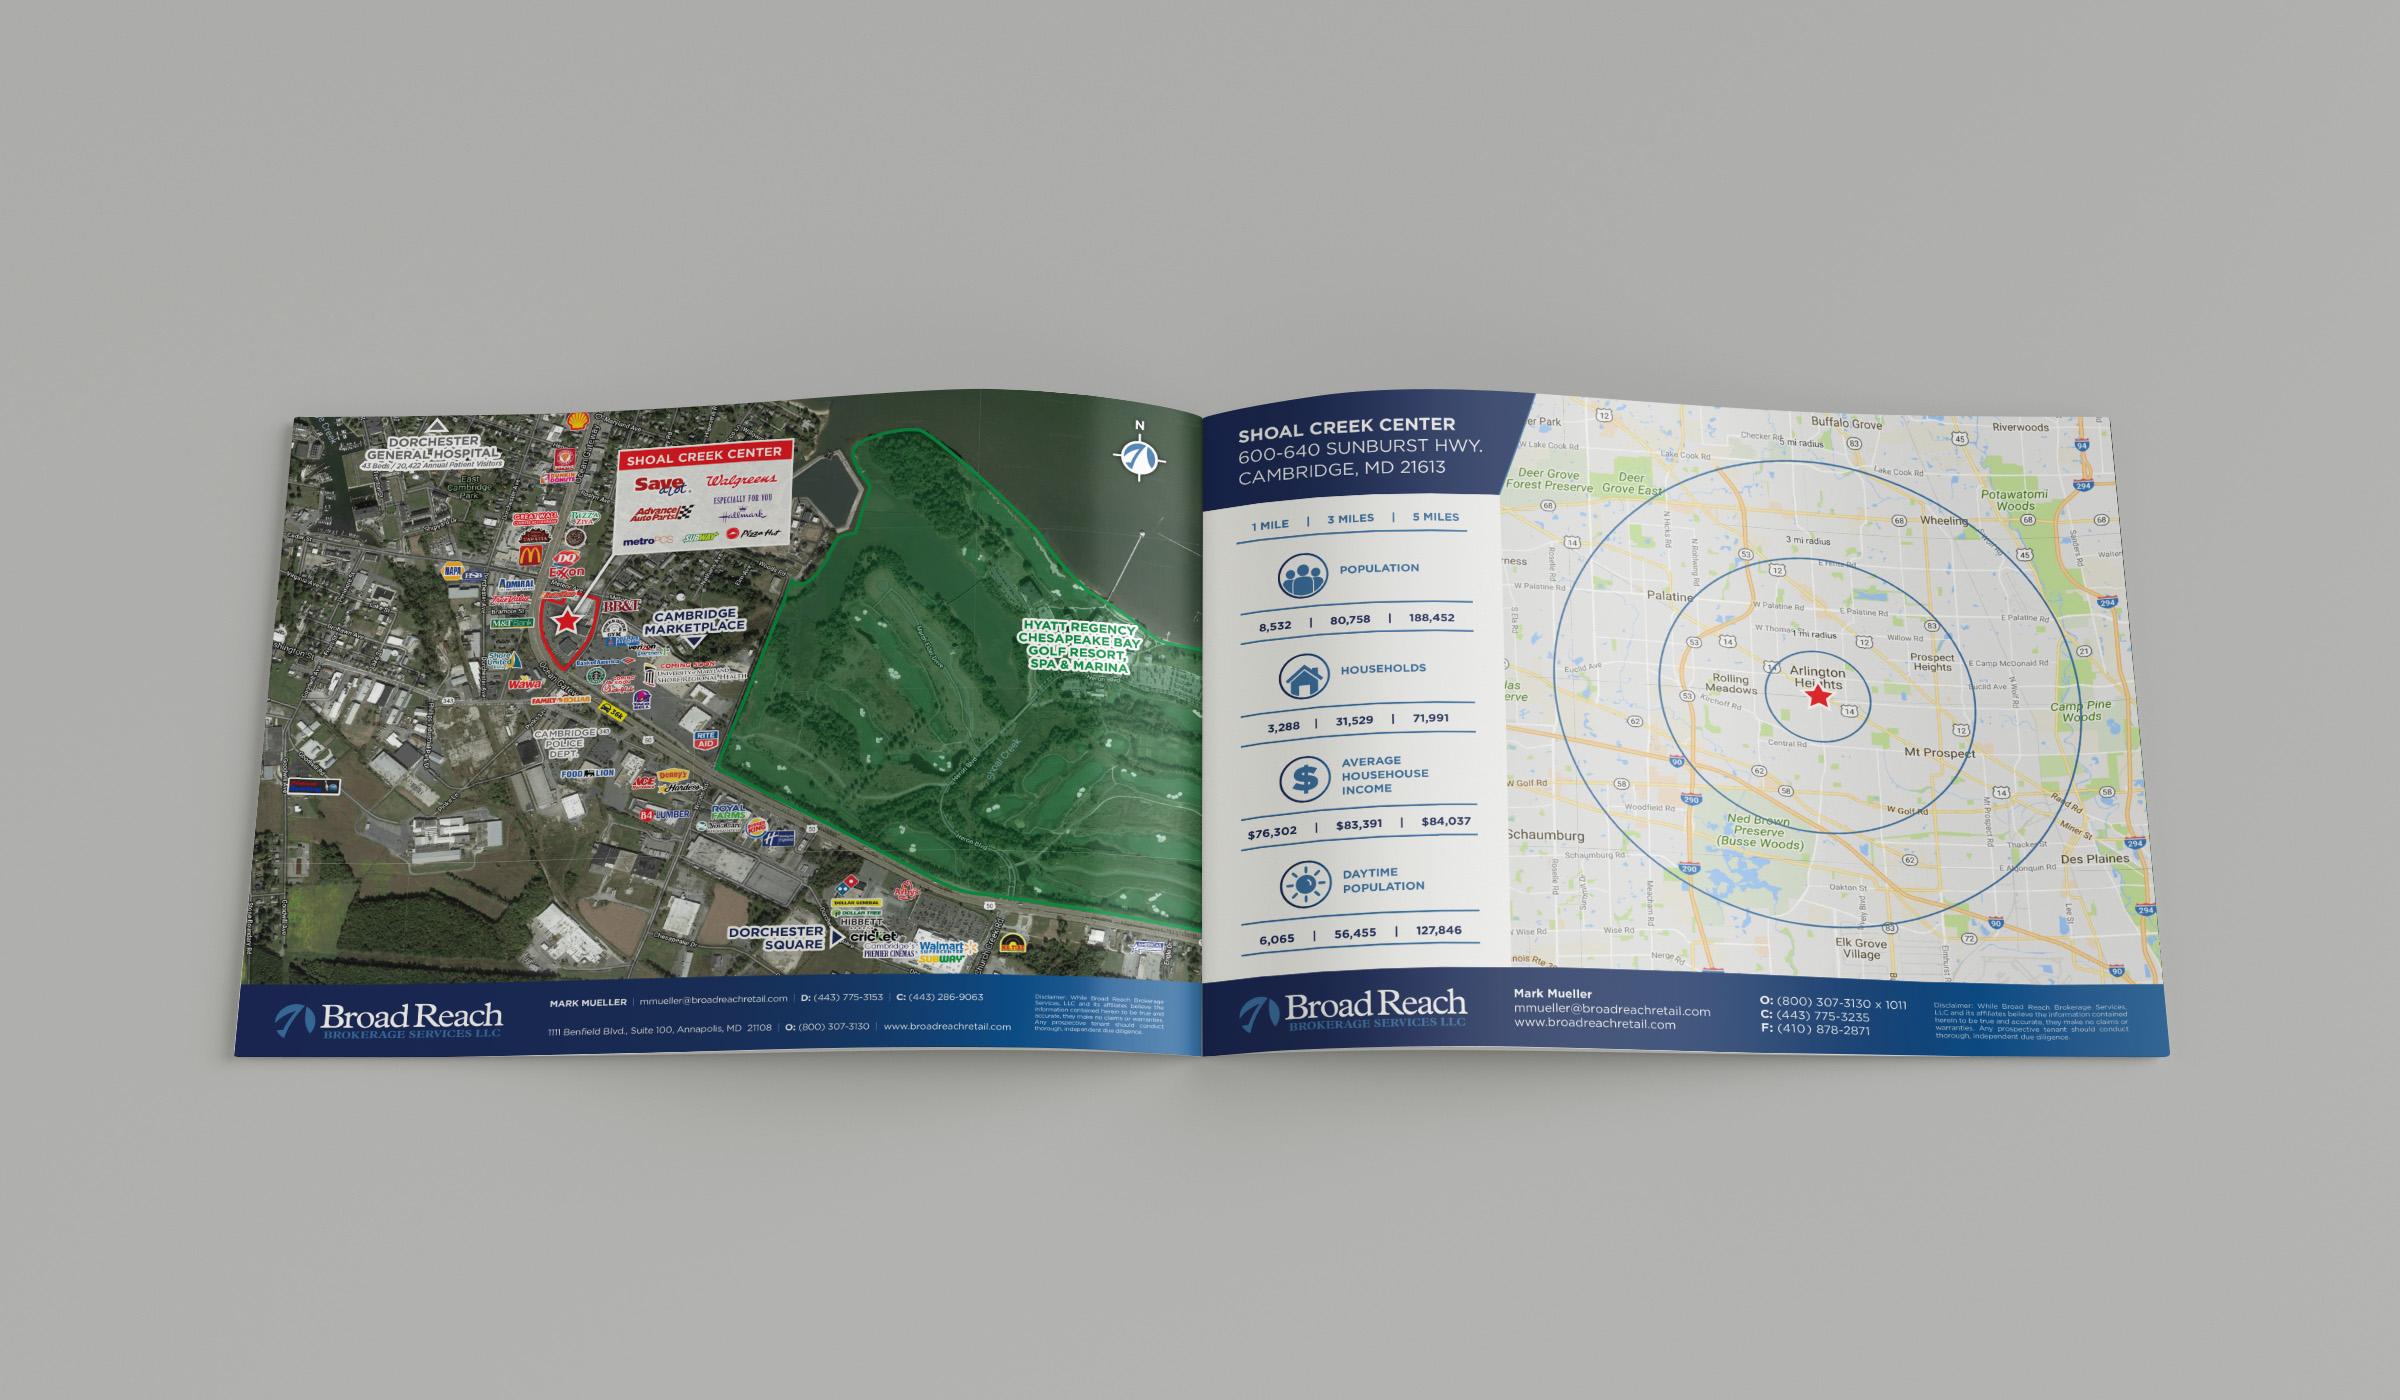 Mockup_HorizontalA5_Brochure_3_BR-Shoal-2b.jpg